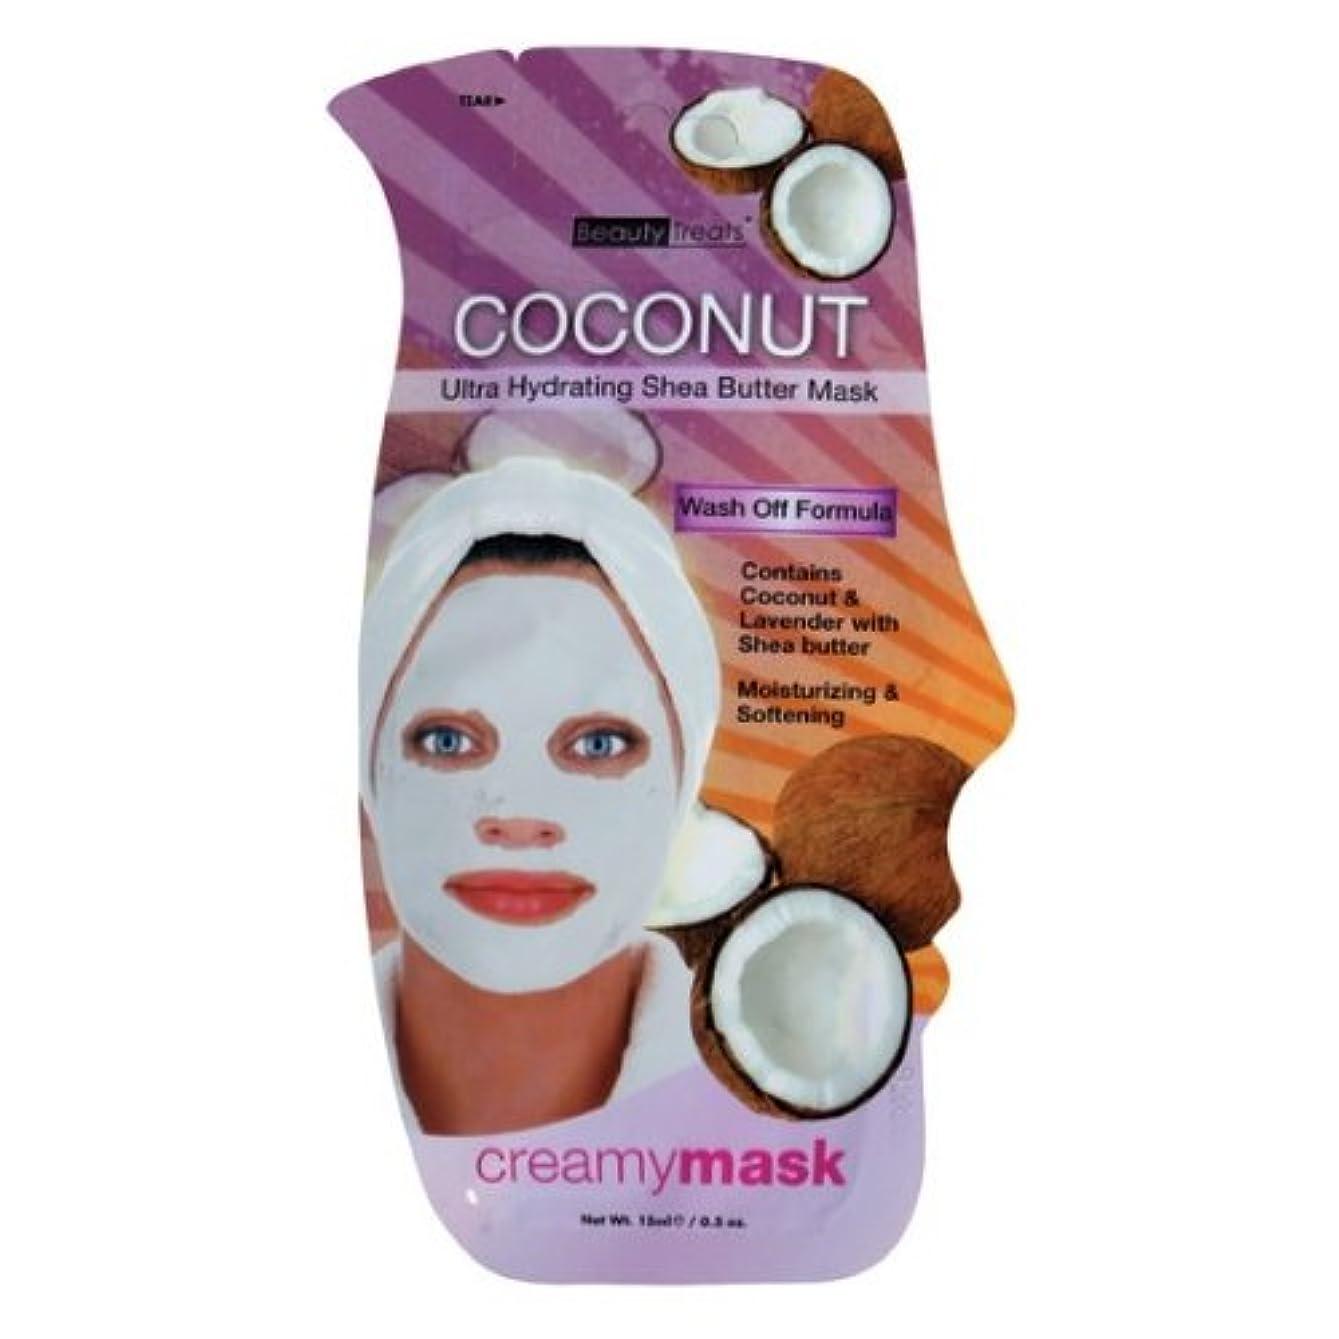 勝者土曜日学期(6 Pack) BEAUTY TREATS Coconut Ultra Hydrating Shea Butter Mask - Coconut (並行輸入品)